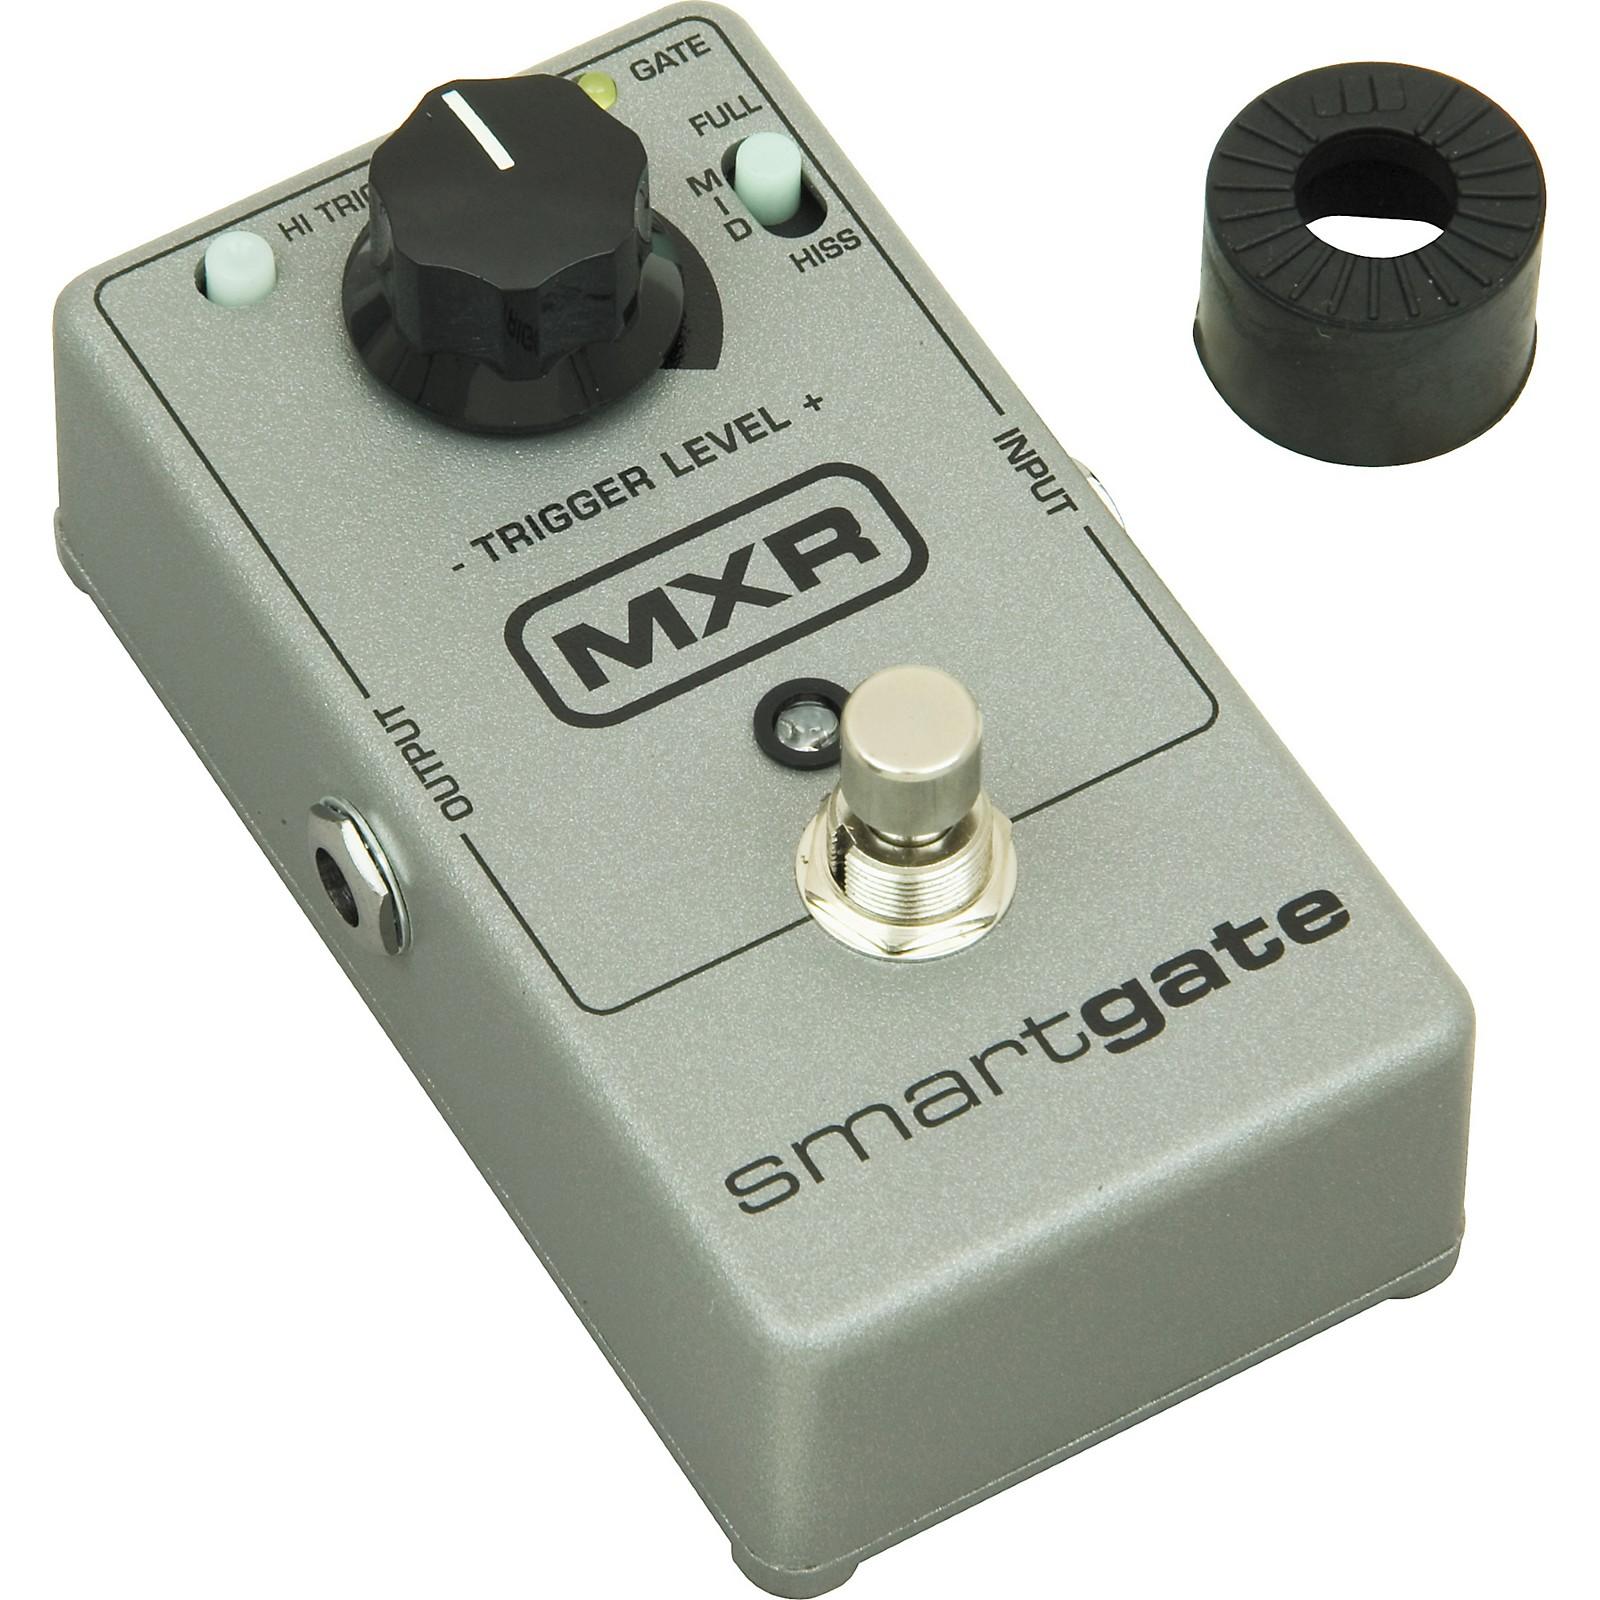 MXR M-135 Smart Gate Pedal